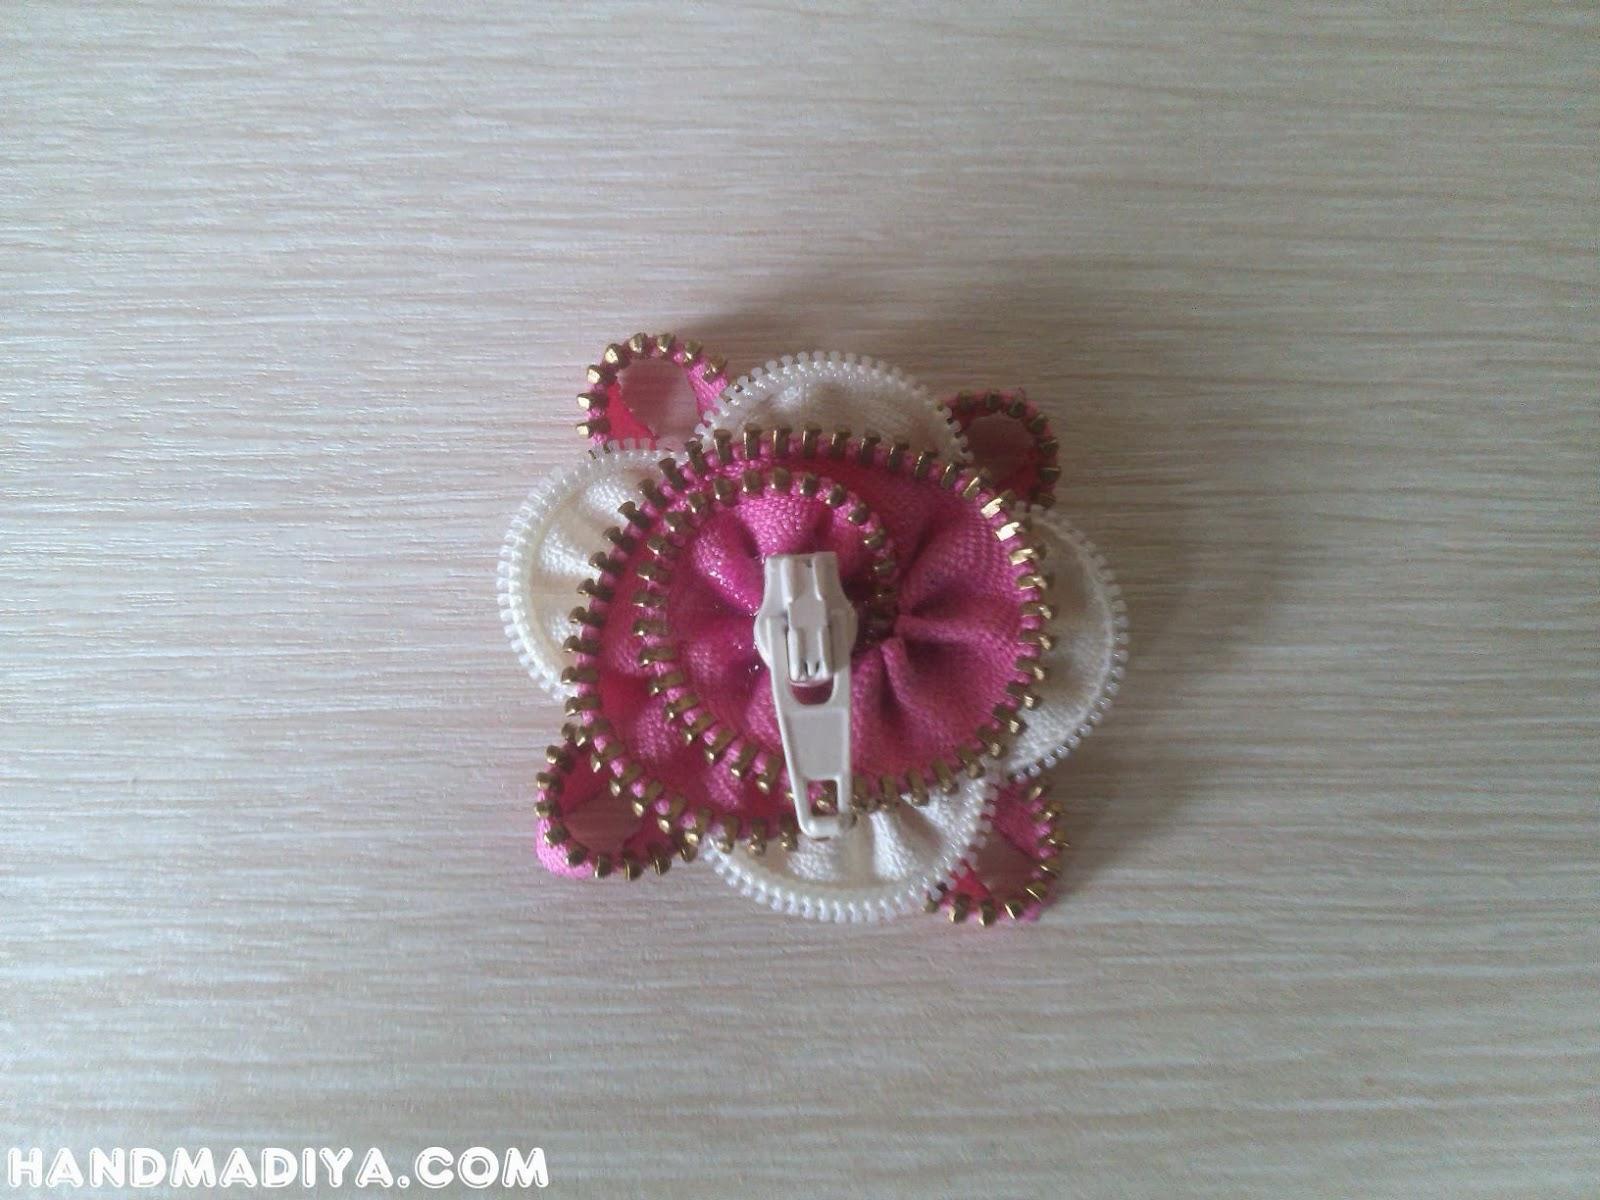 Резинка для волос с цветком из молний. Scrunchy with flower zipper  step-by-step tutorials